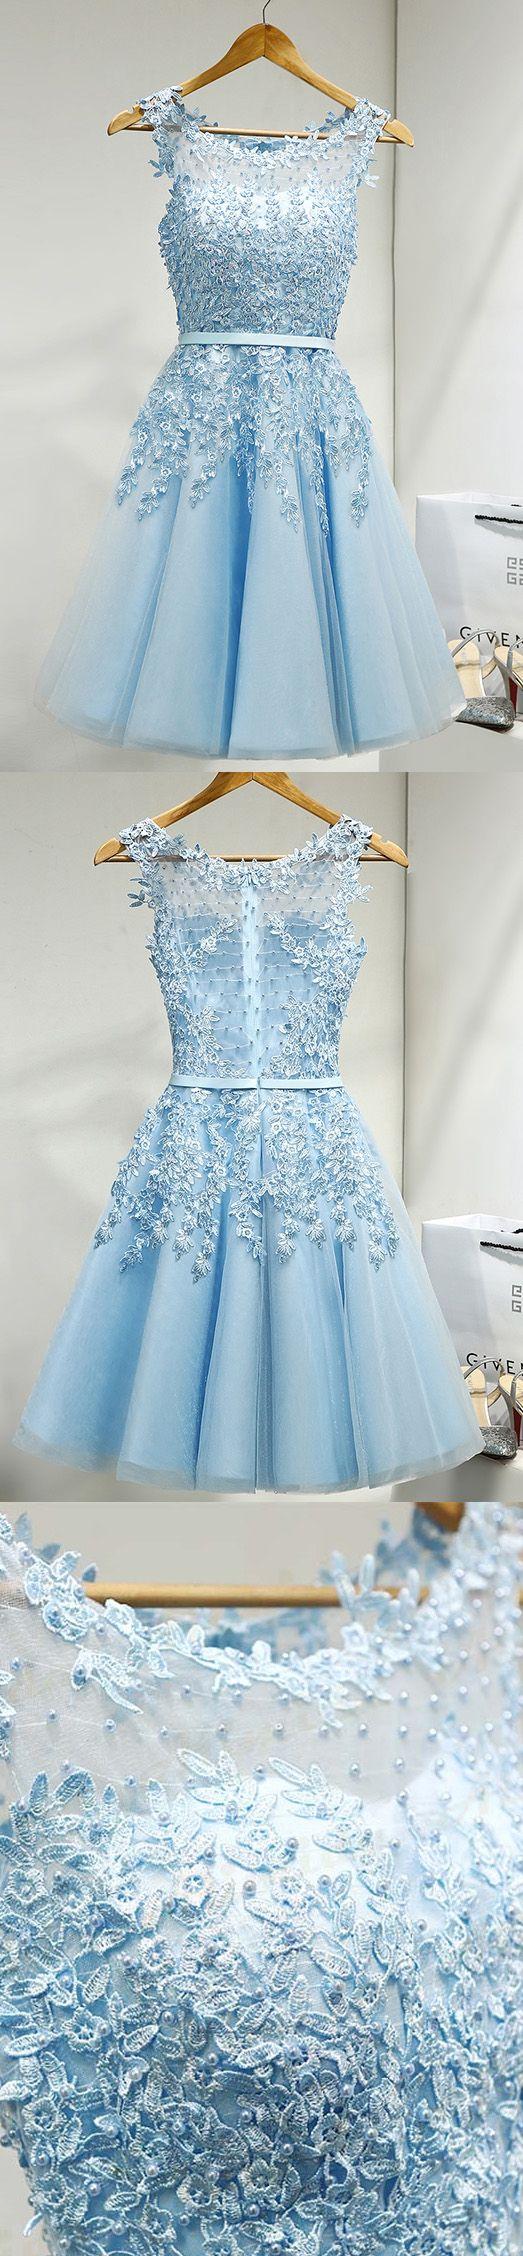 Beadedbeading light blue party homecoming dresses appealing short